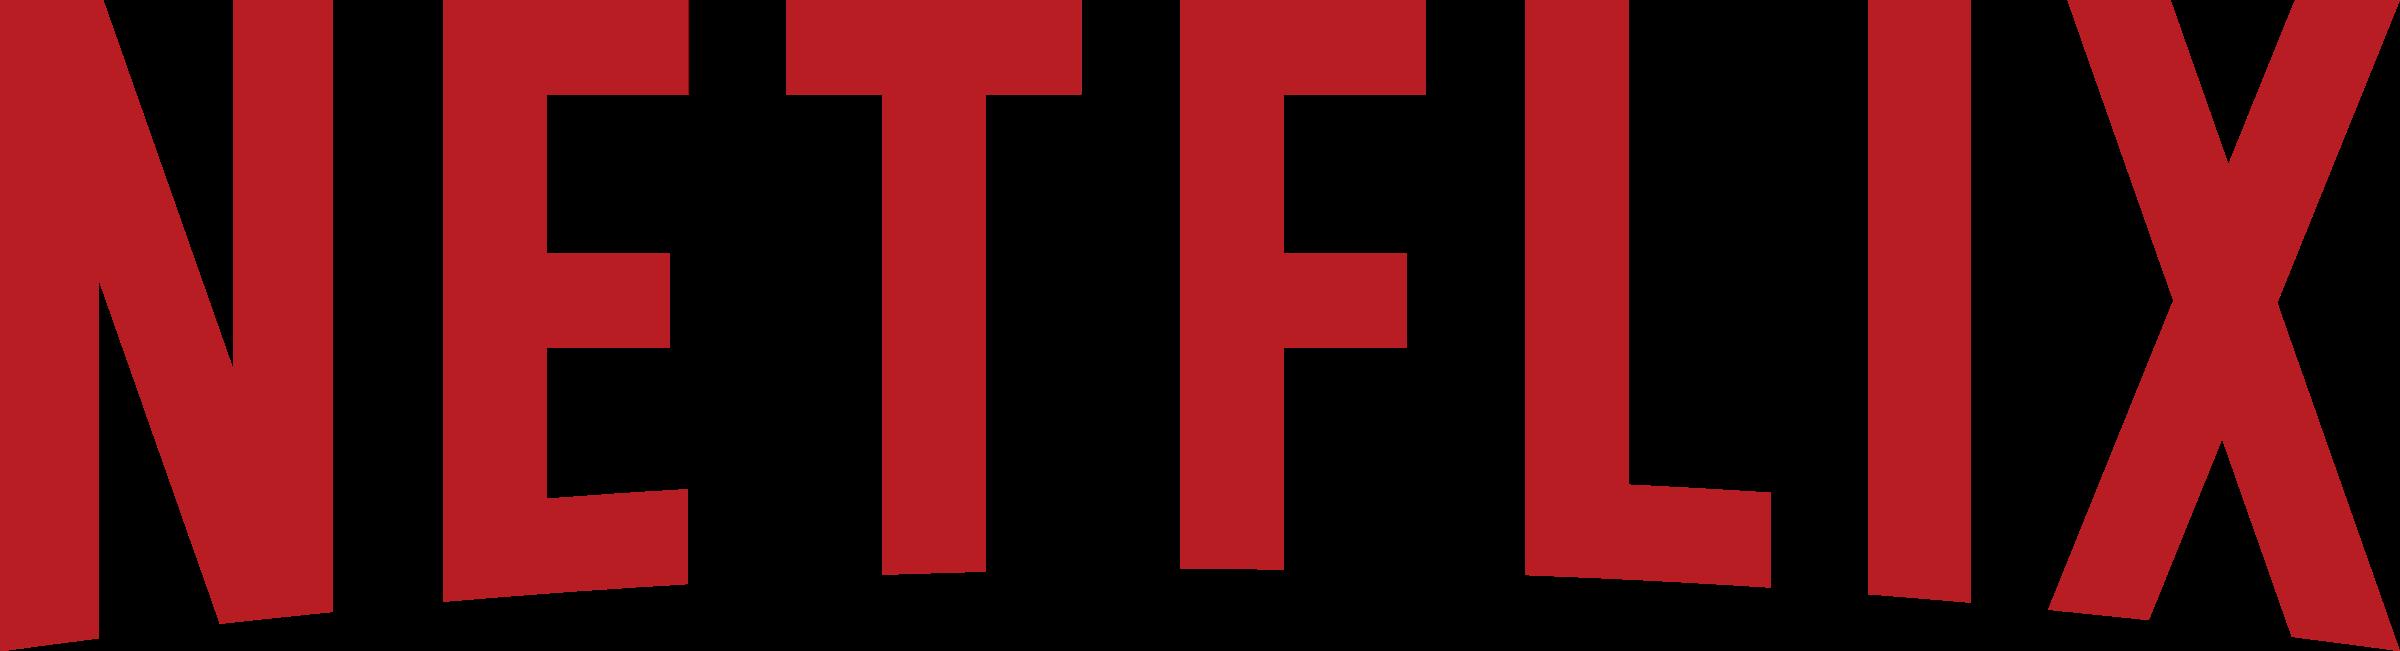 Netflix Logo PNG Transparent & SVG Vector - Freebie Supply